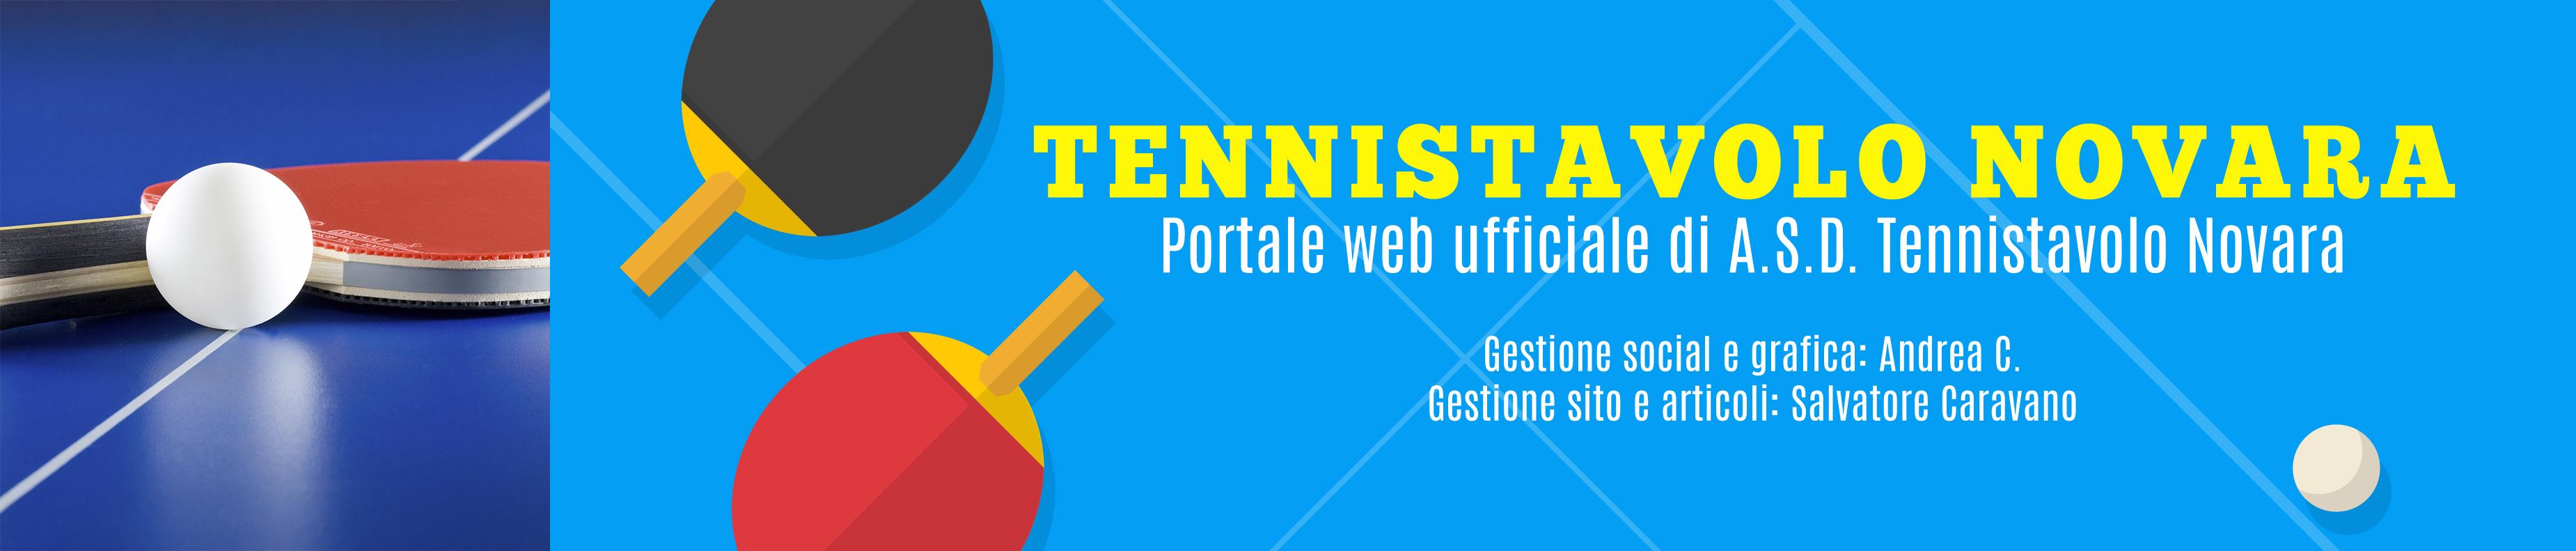 A.S.D. Tennistavolo Novara